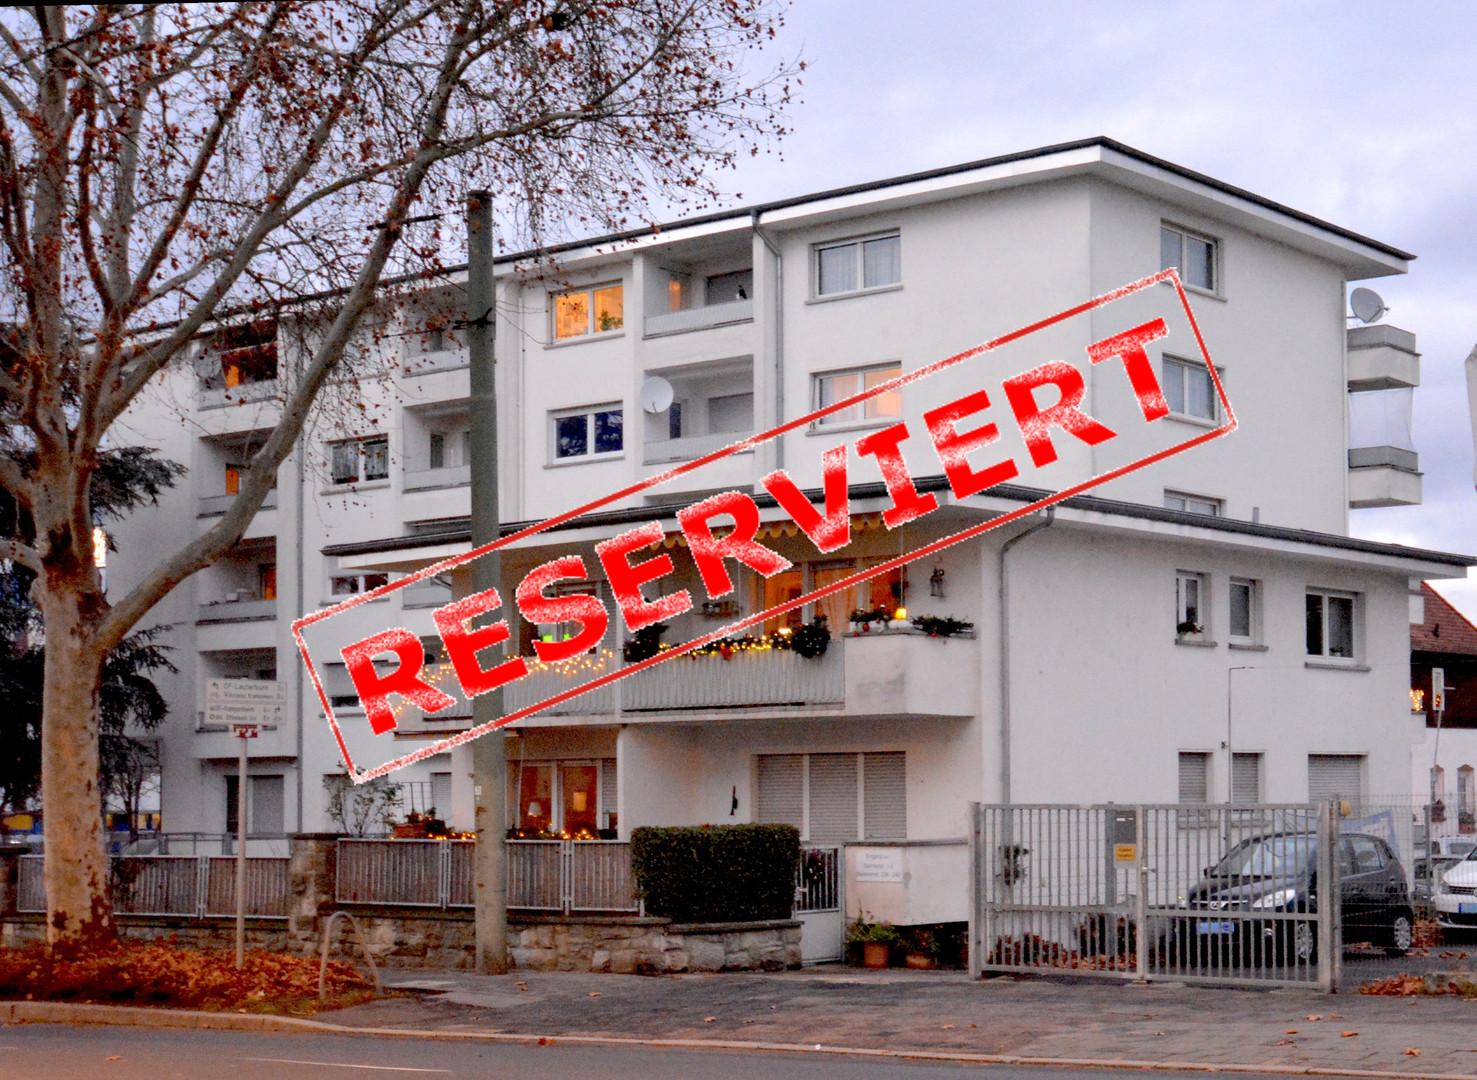 Offenbach11 2.jpg